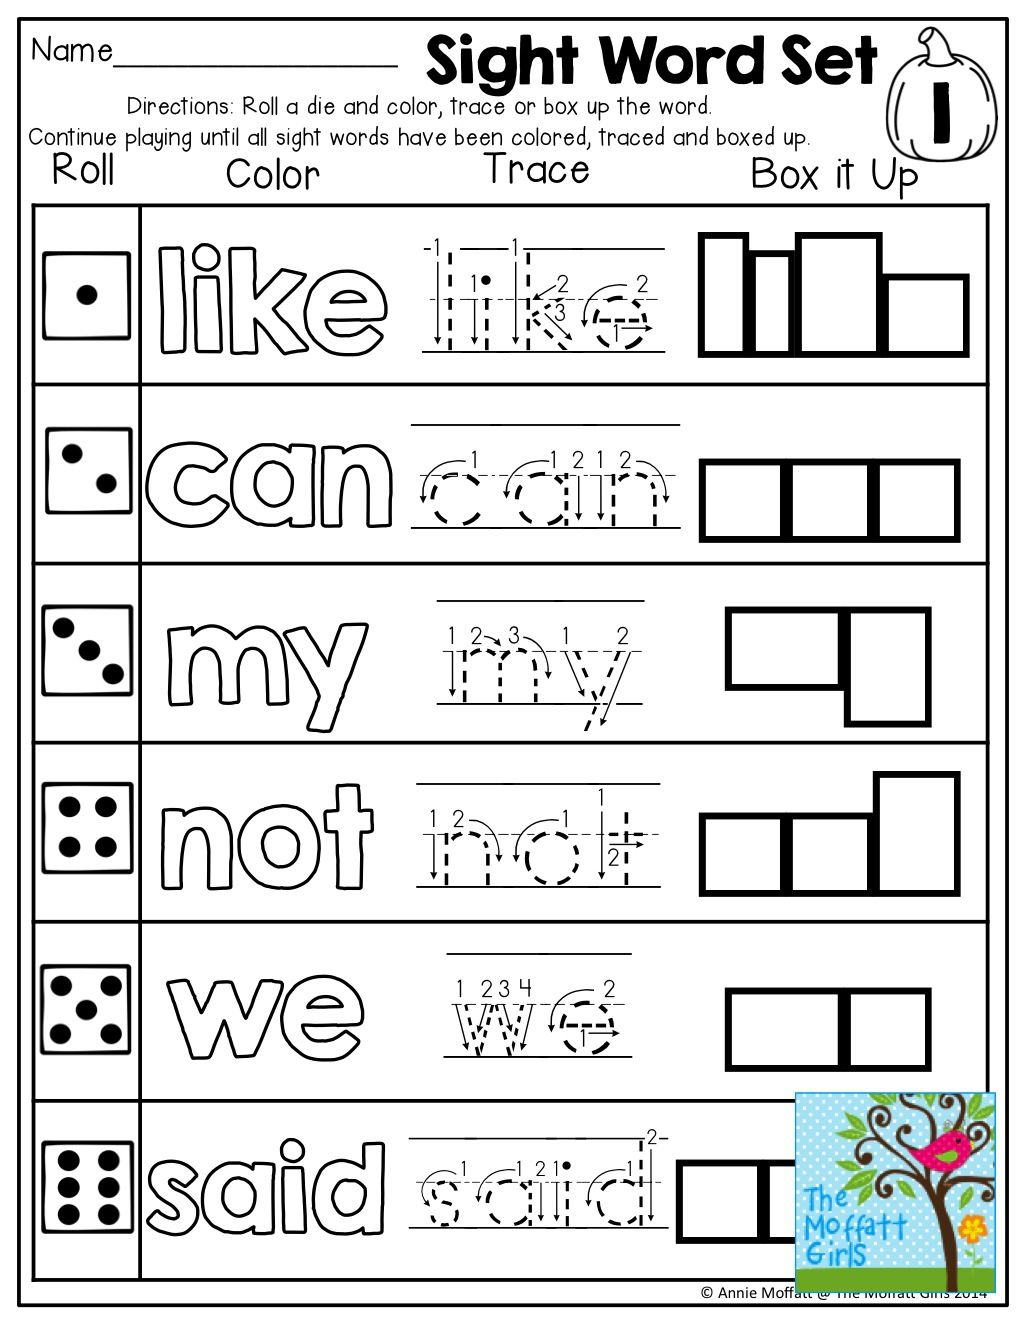 36f44f72a695f5d7ddf41314f3512826 - Sight Word Videos For Kindergarten